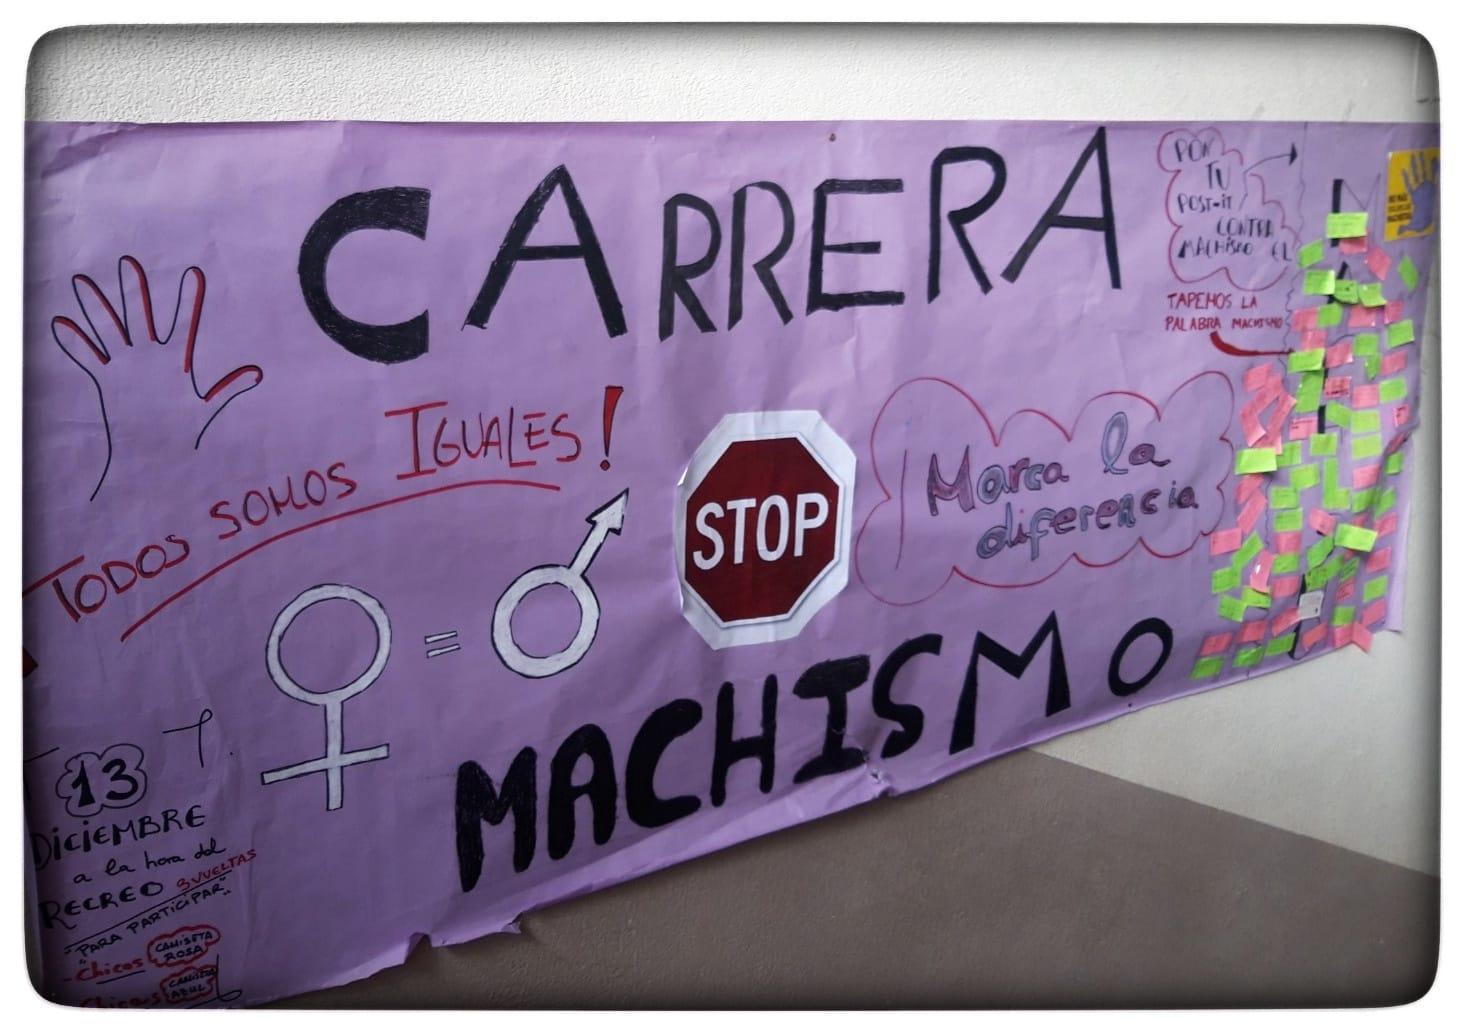 Stop Machismo